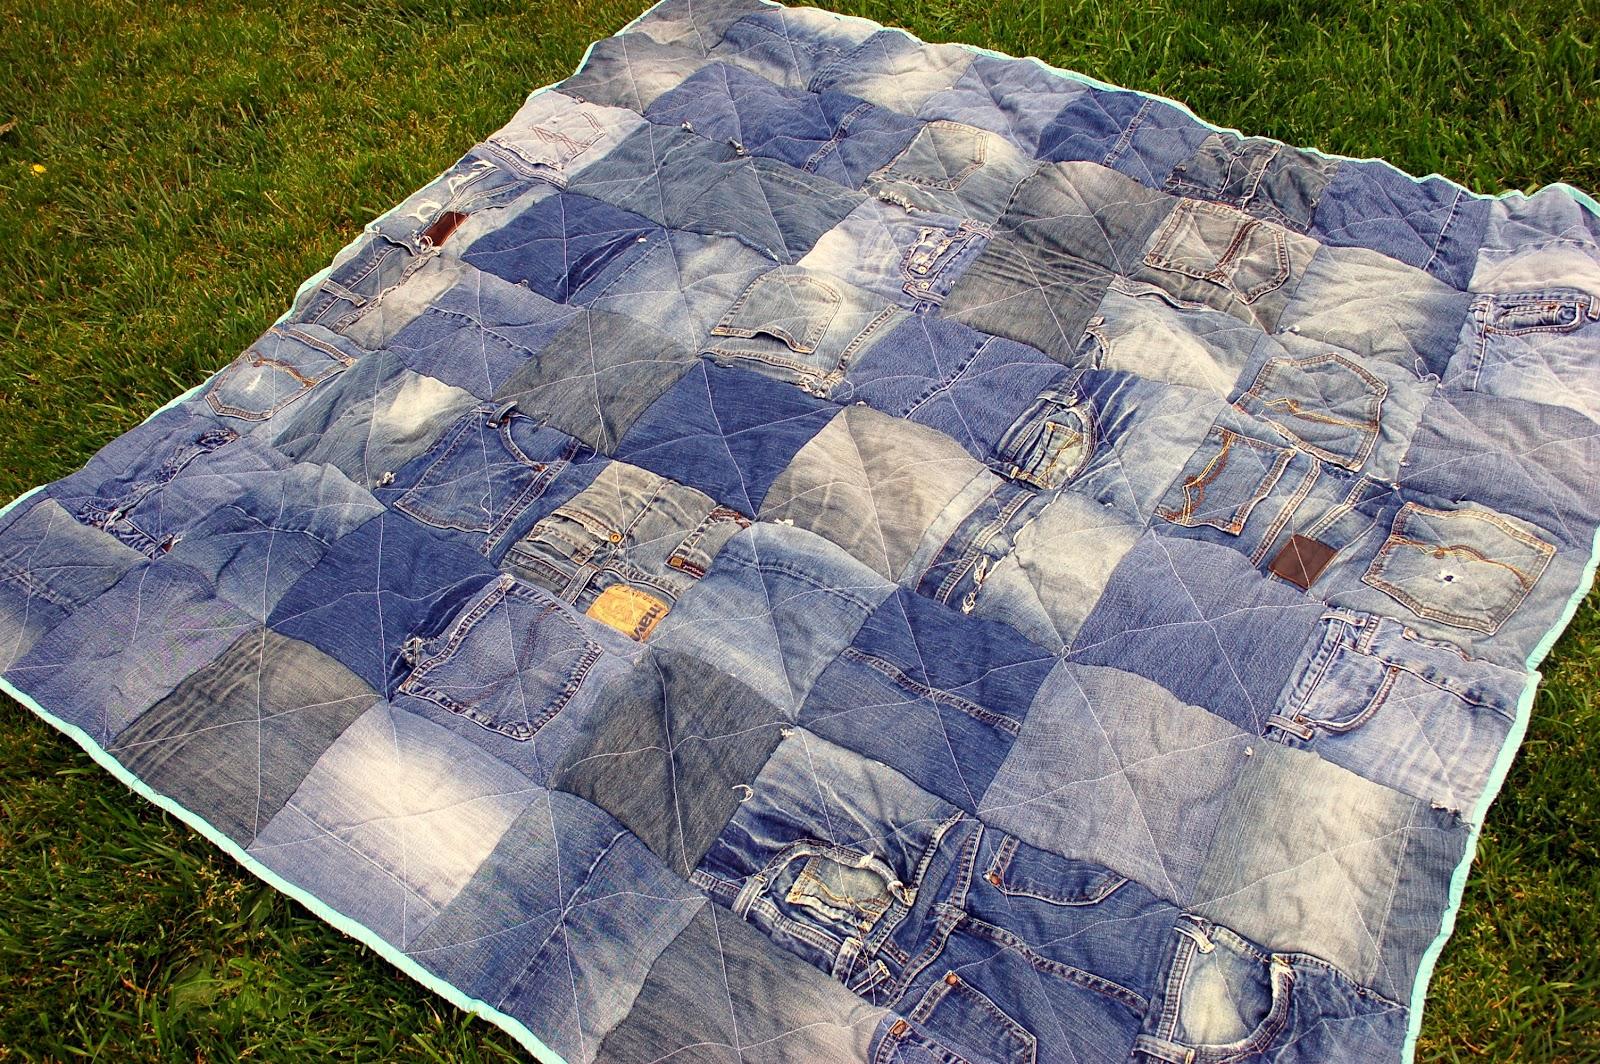 DIY Denim Quilt - iCandy handmade : denim quilt - Adamdwight.com